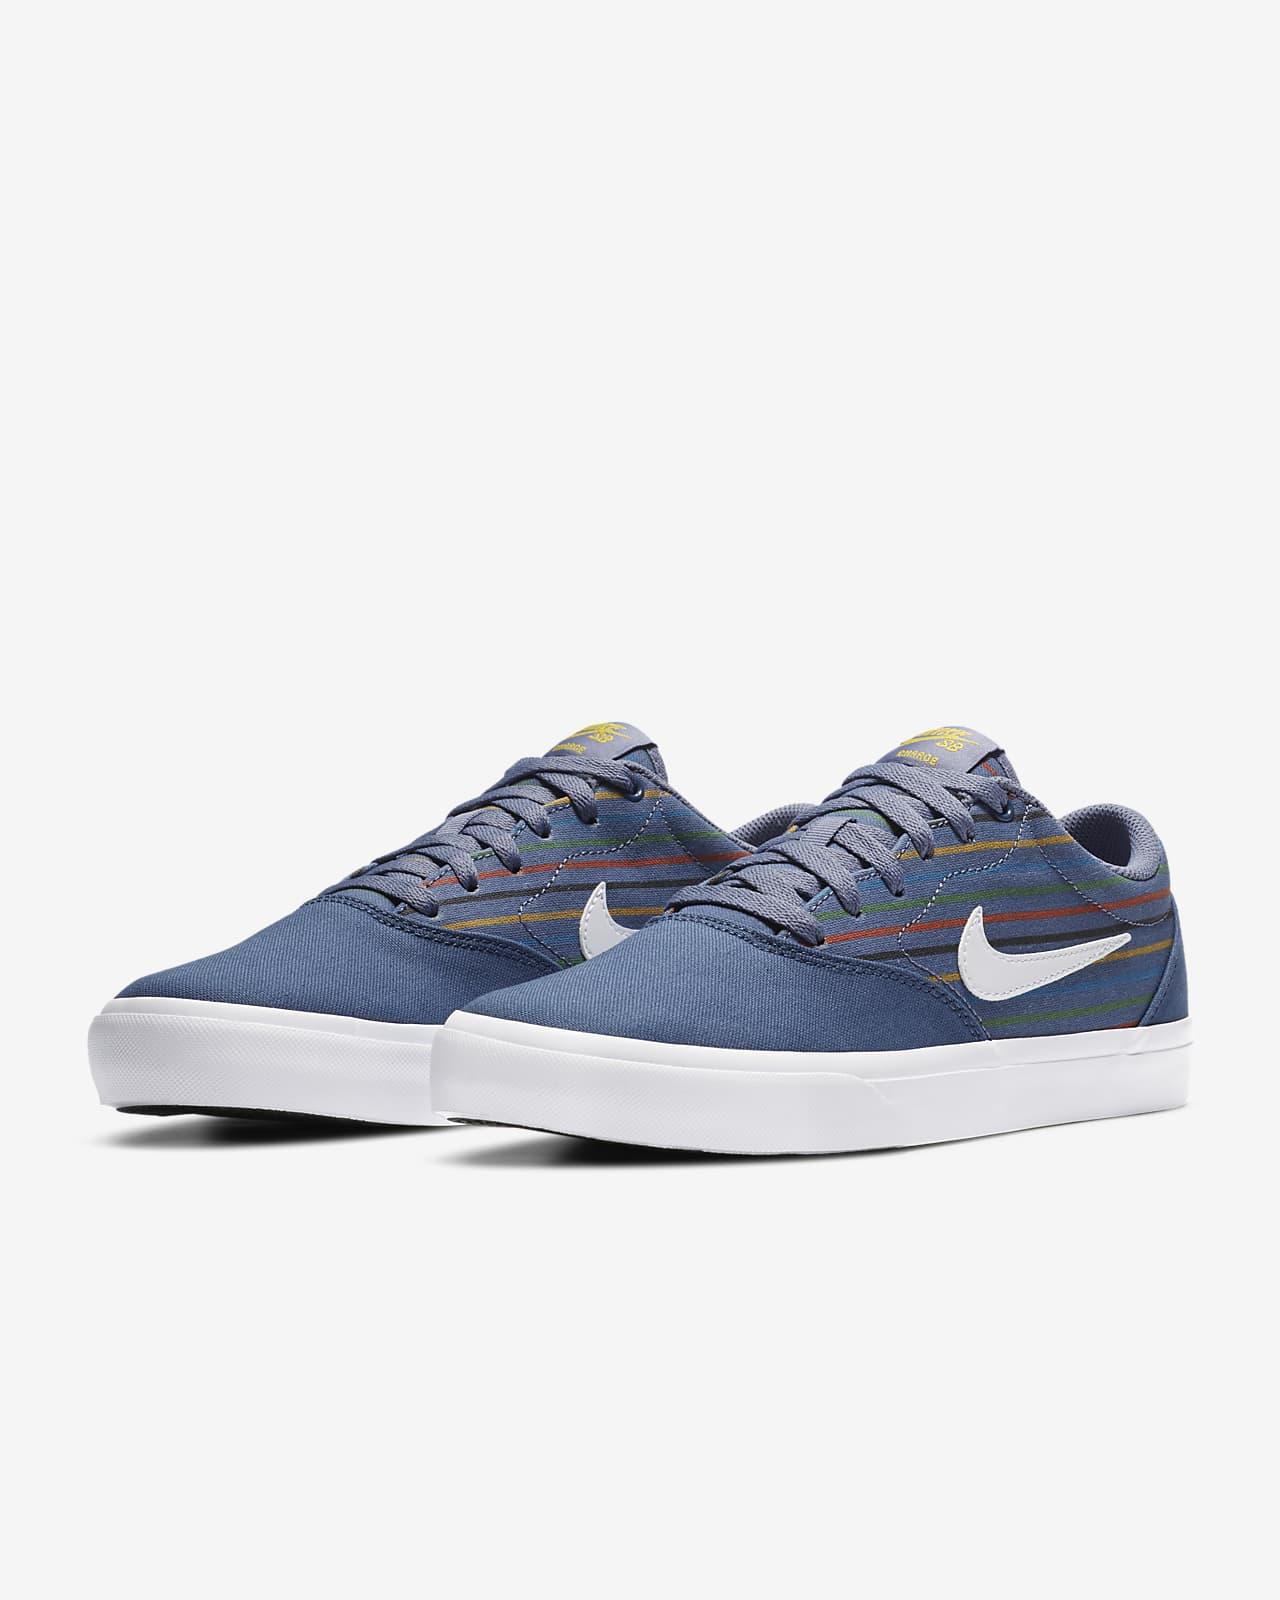 Skateboard Chaussures de Skateboard Mixte Nike SB Charge Canvas ...